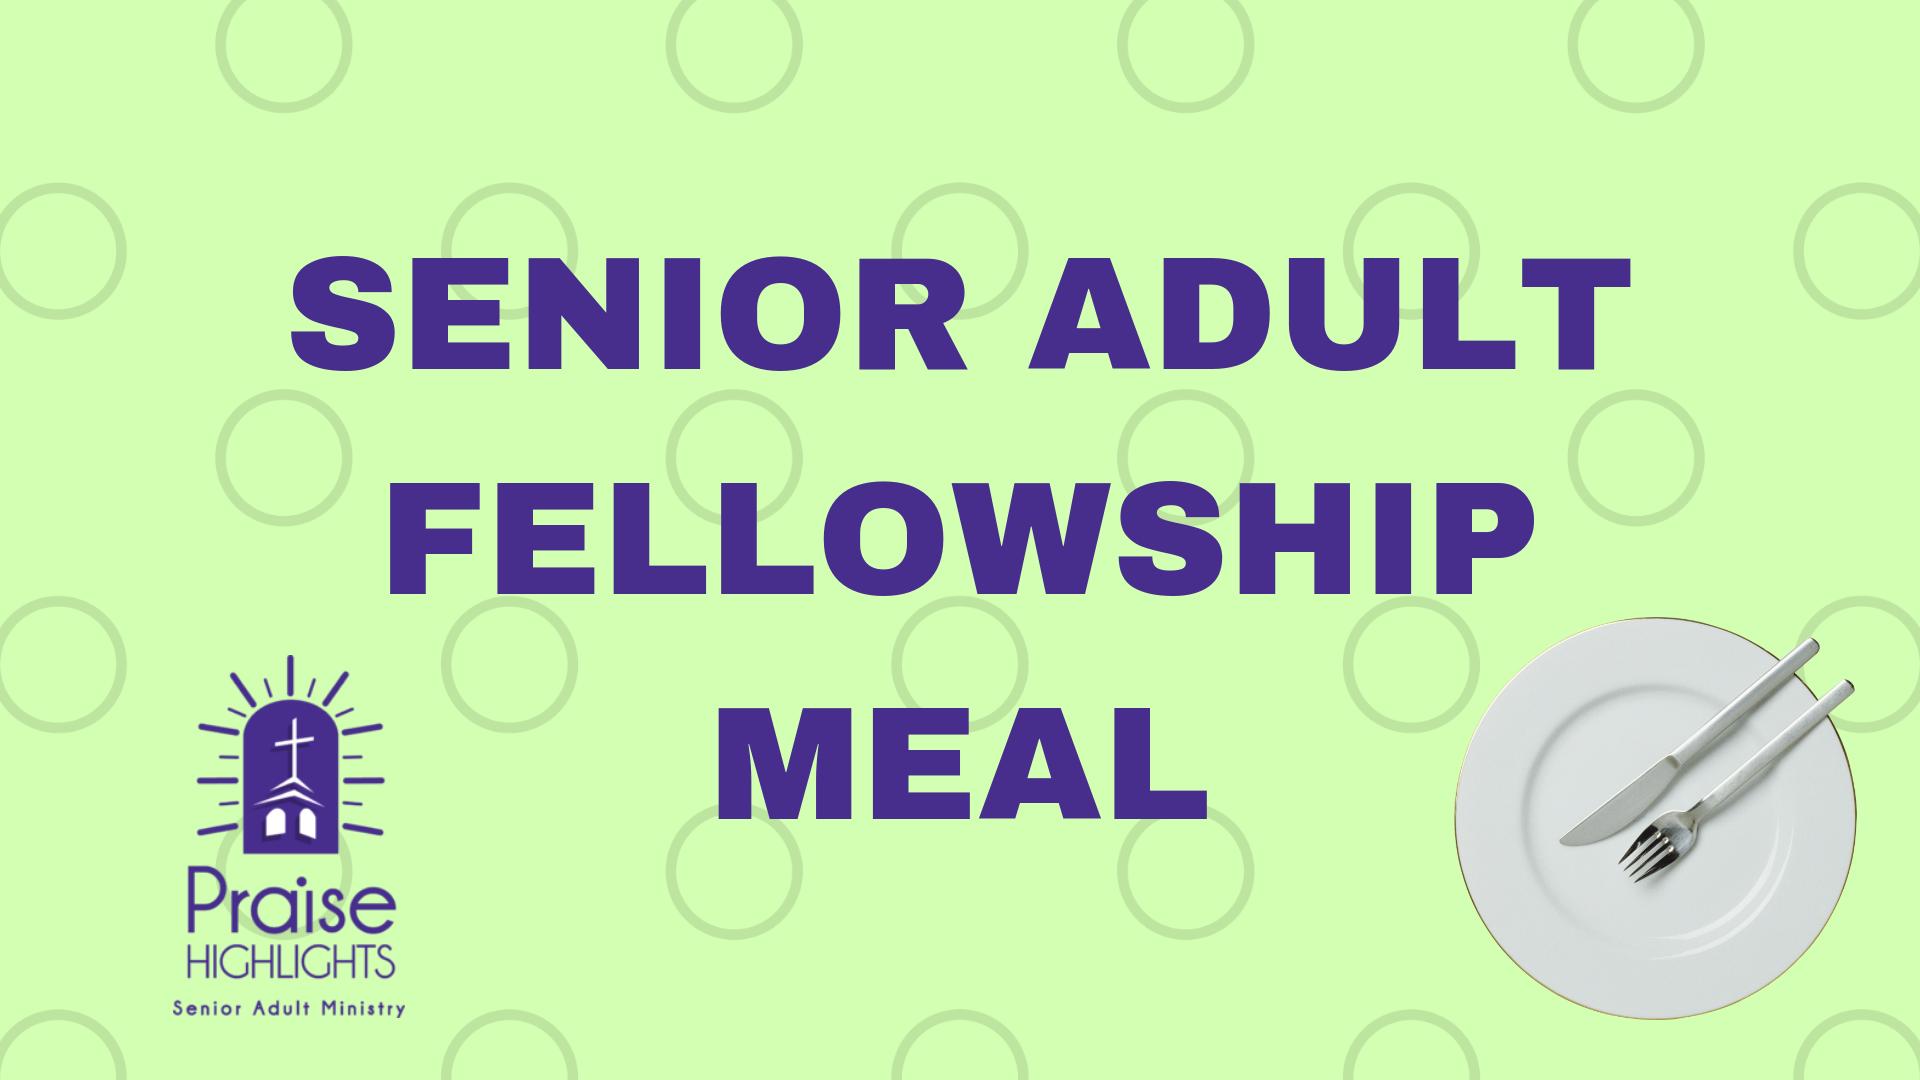 Senior Adult Fellowship Meal